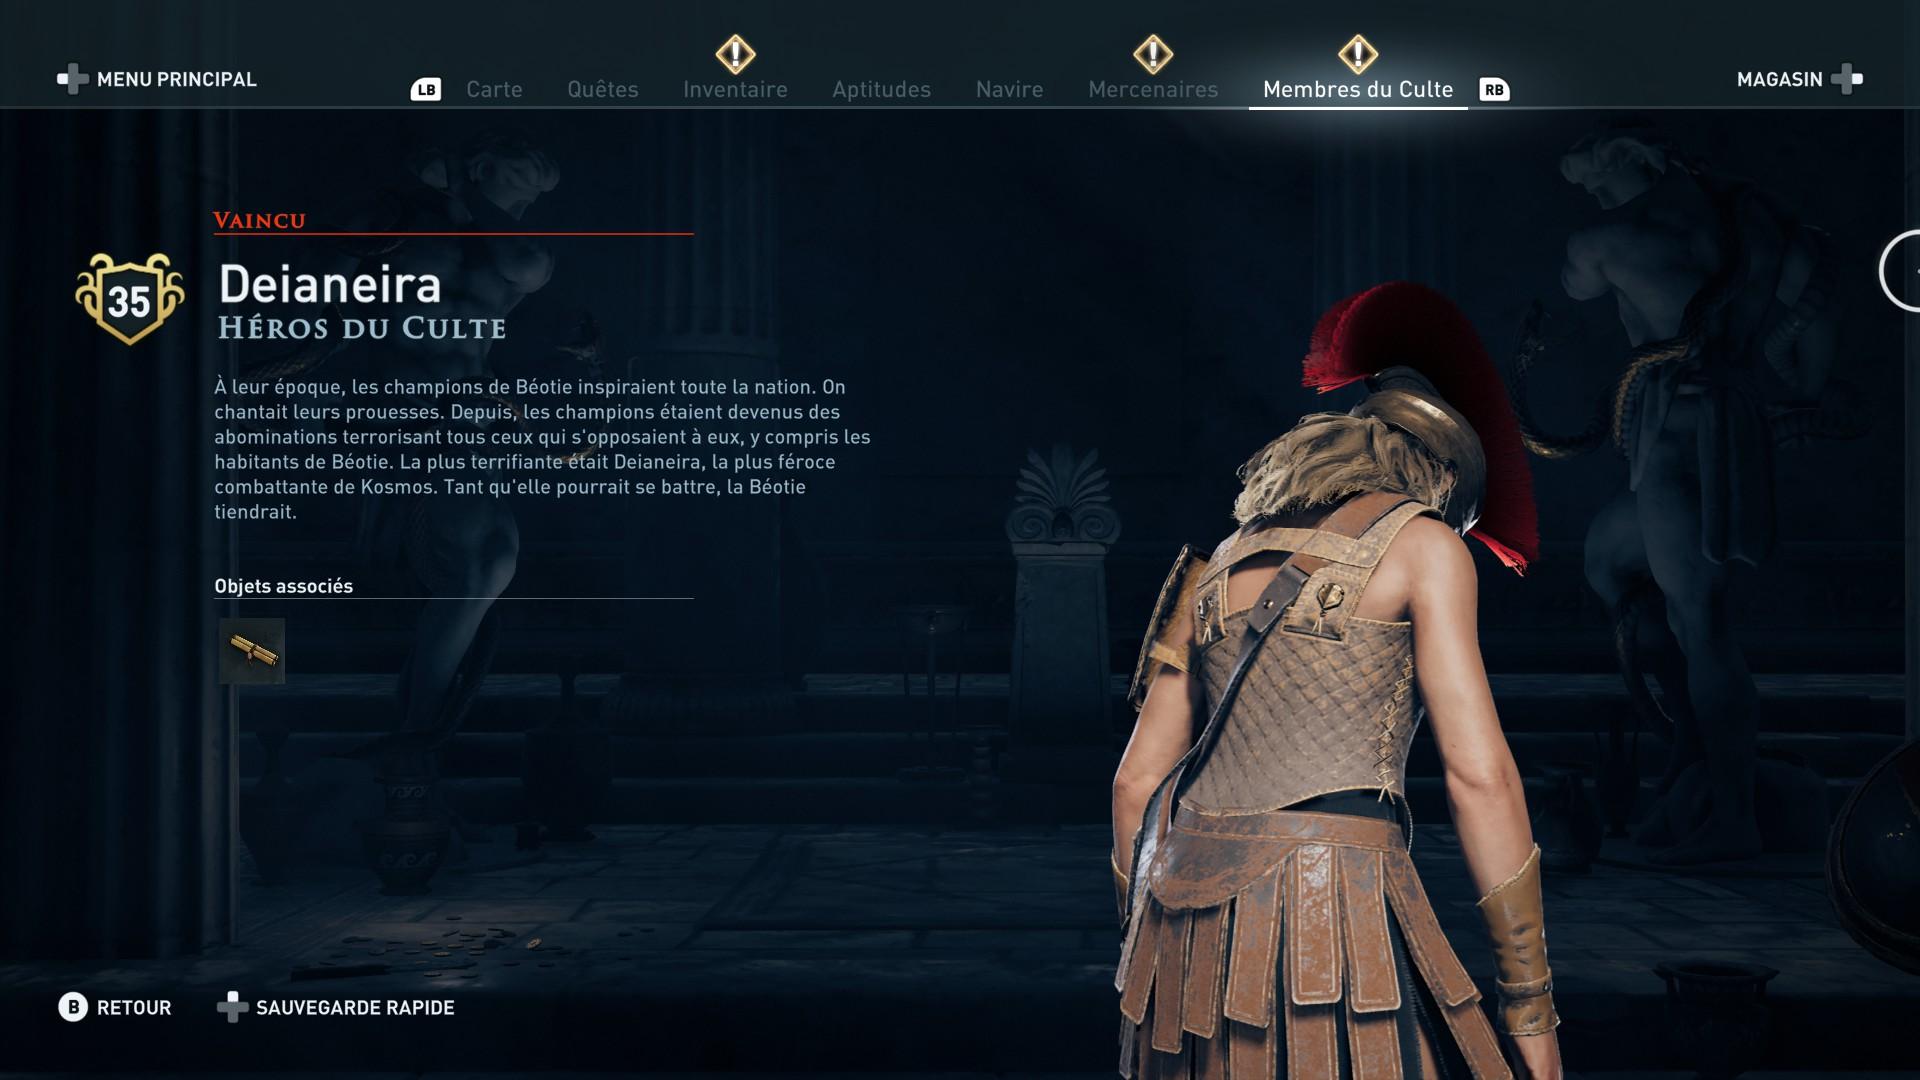 Assassin's Creed Odyssey trouver et tuer les adeptes du culte du Kosmos, ps4, xbox one, pc, ubisoft, jeu vidéo, Deianeira héros du culte